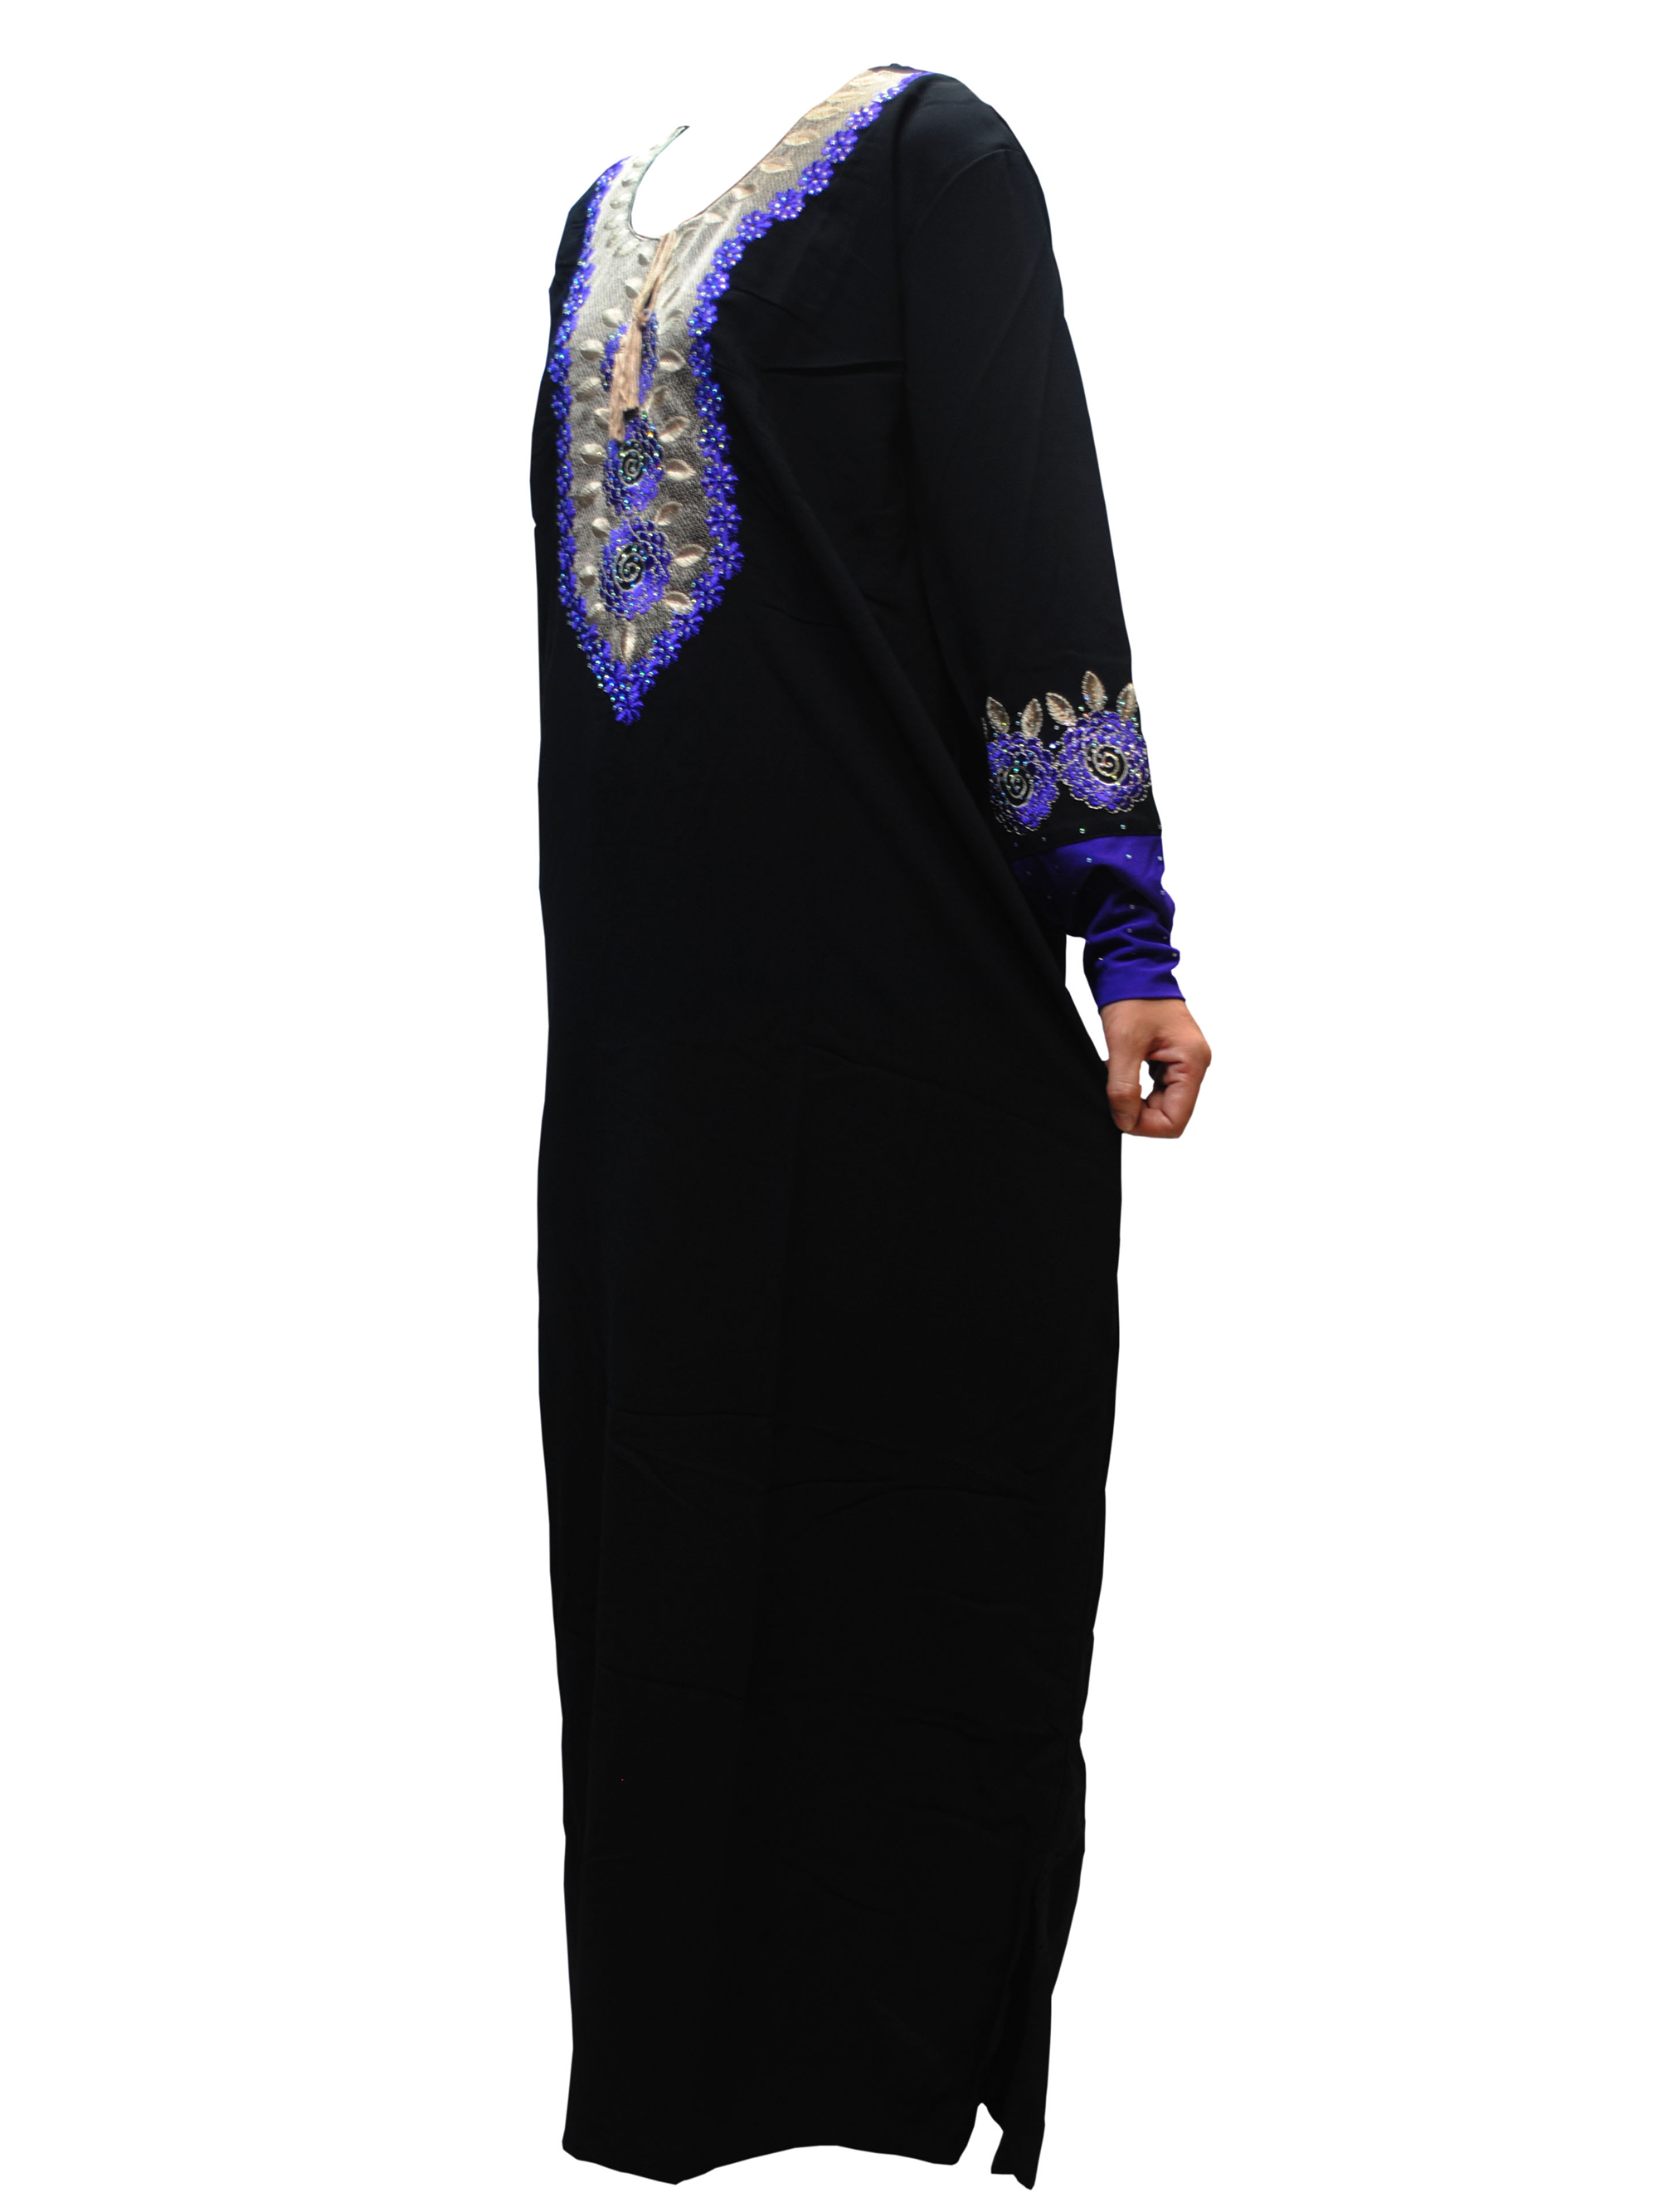 FREE SHIPPING Dubai Lady Abaya Middle East Robe Ramadan Clothes Diamond AndEmbroidery Kaftan Jibab Islamic Muslim Dress Forwomen